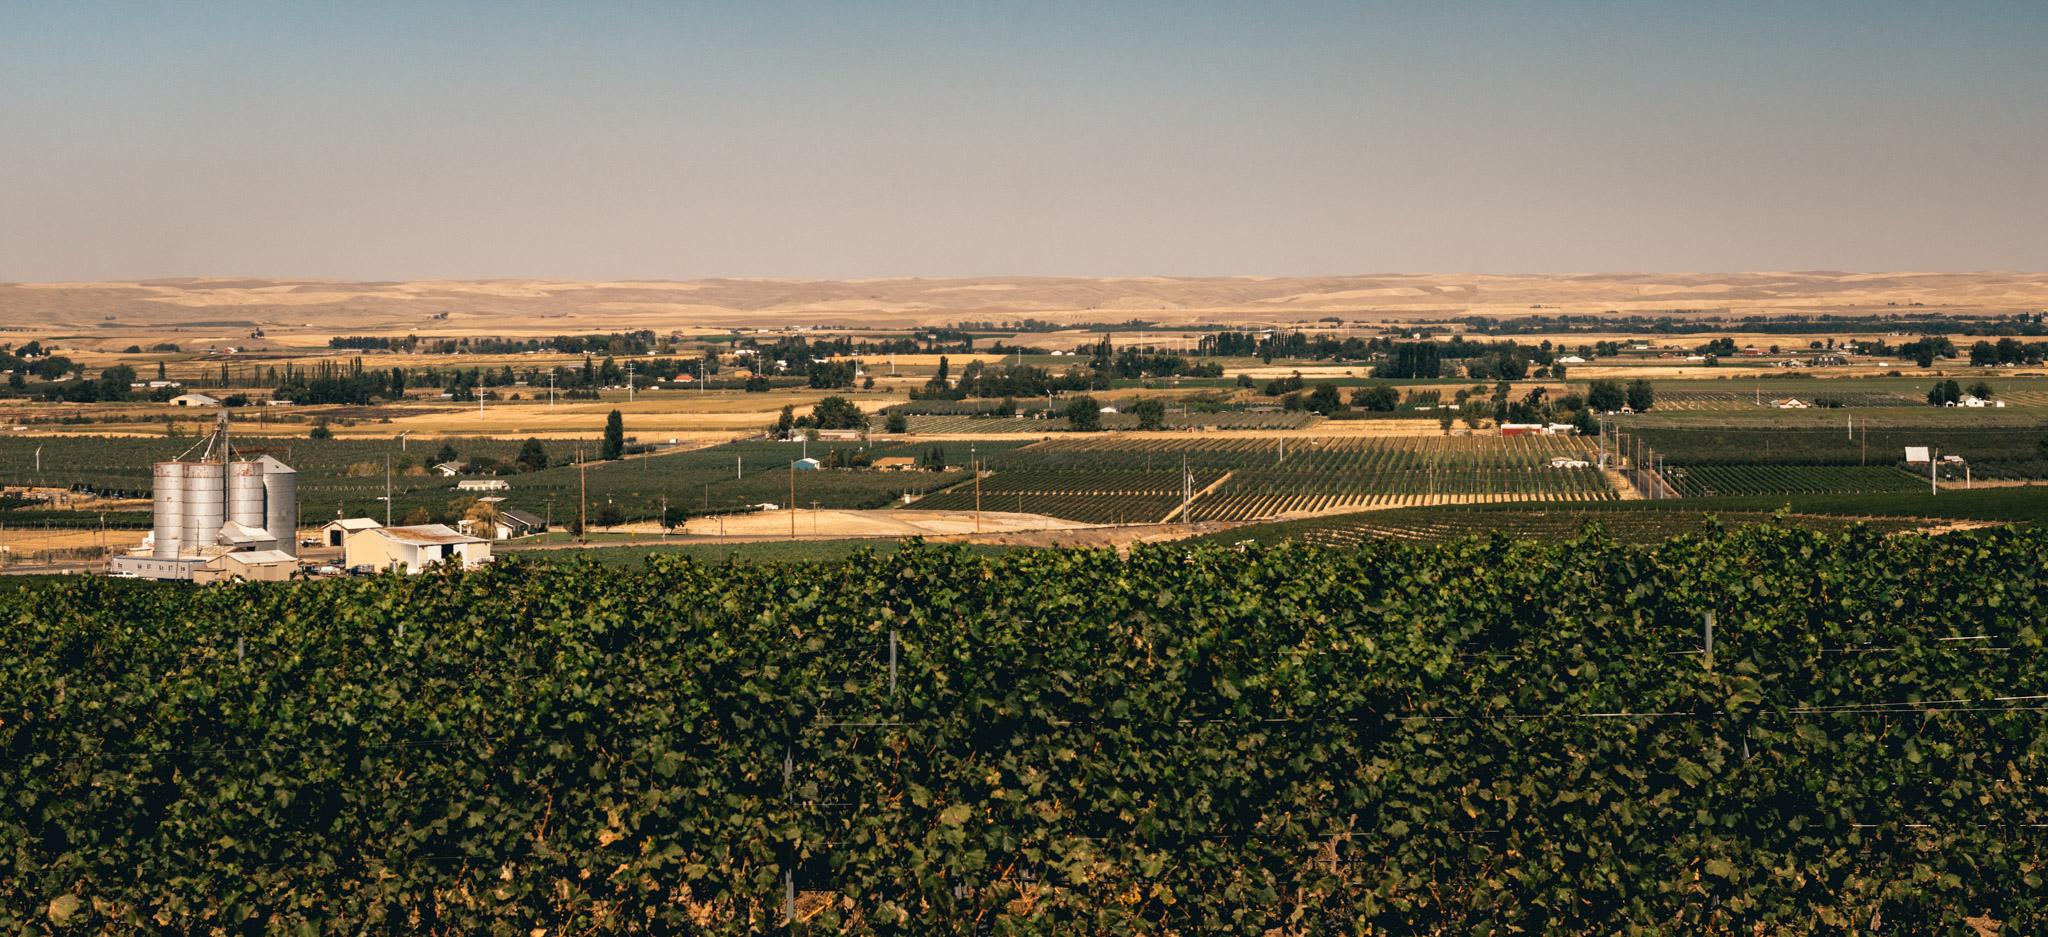 US : Washington : Vineyards in the Seven Hills area of Walla Walla